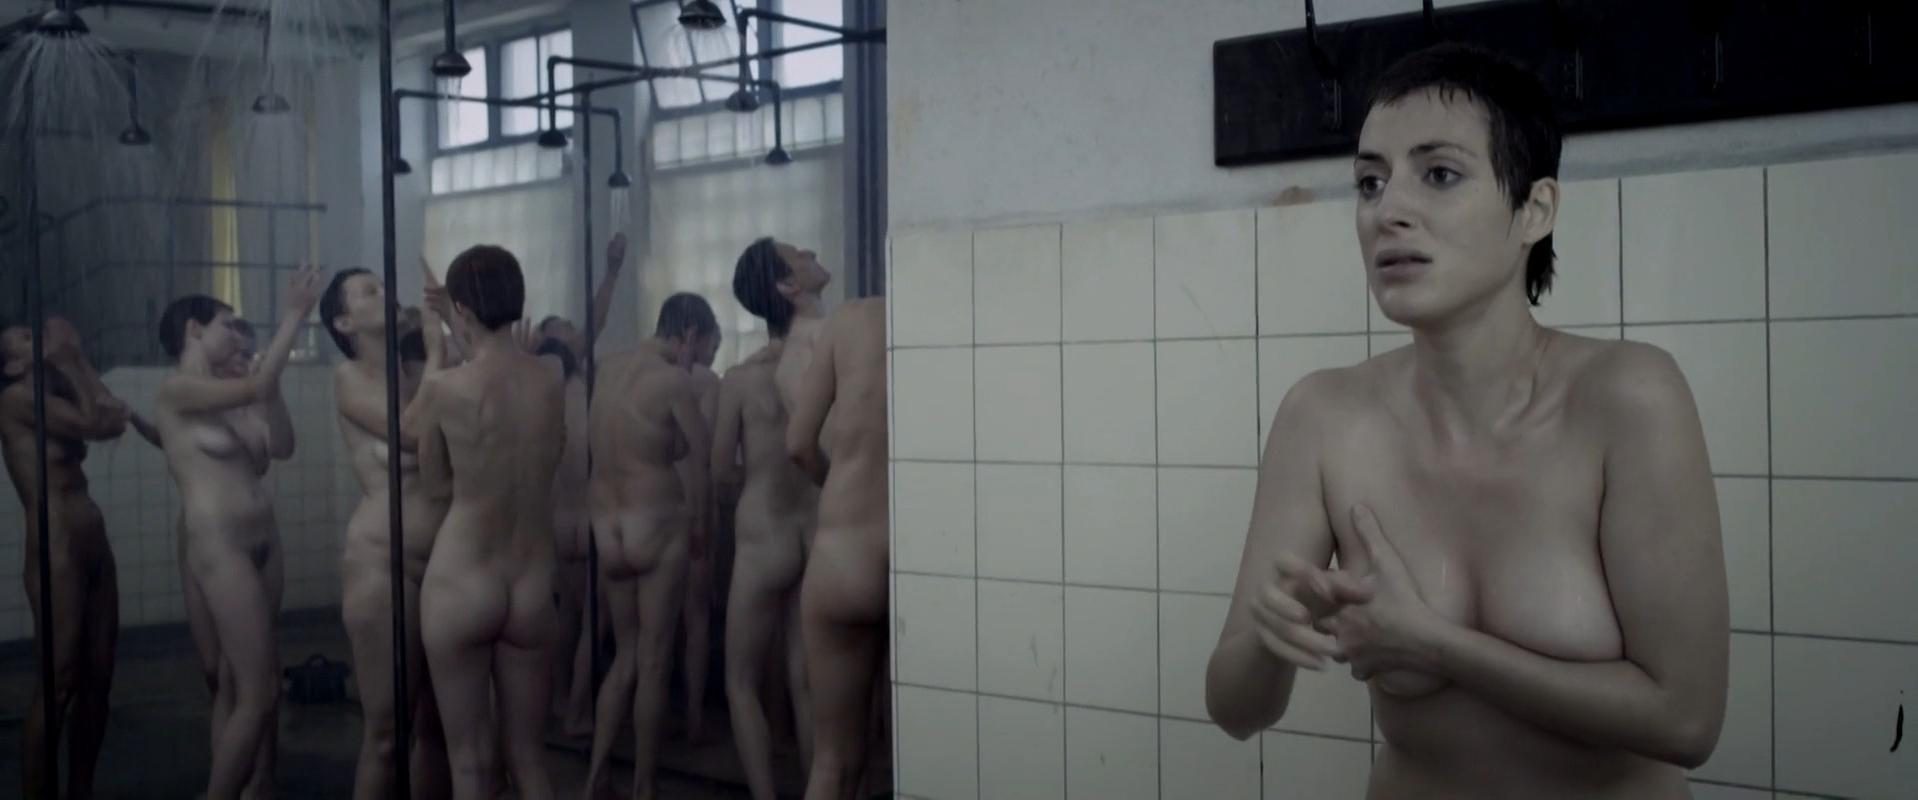 Clemence Thioly nude, Helena Dvorakova nude - Colette (2013)